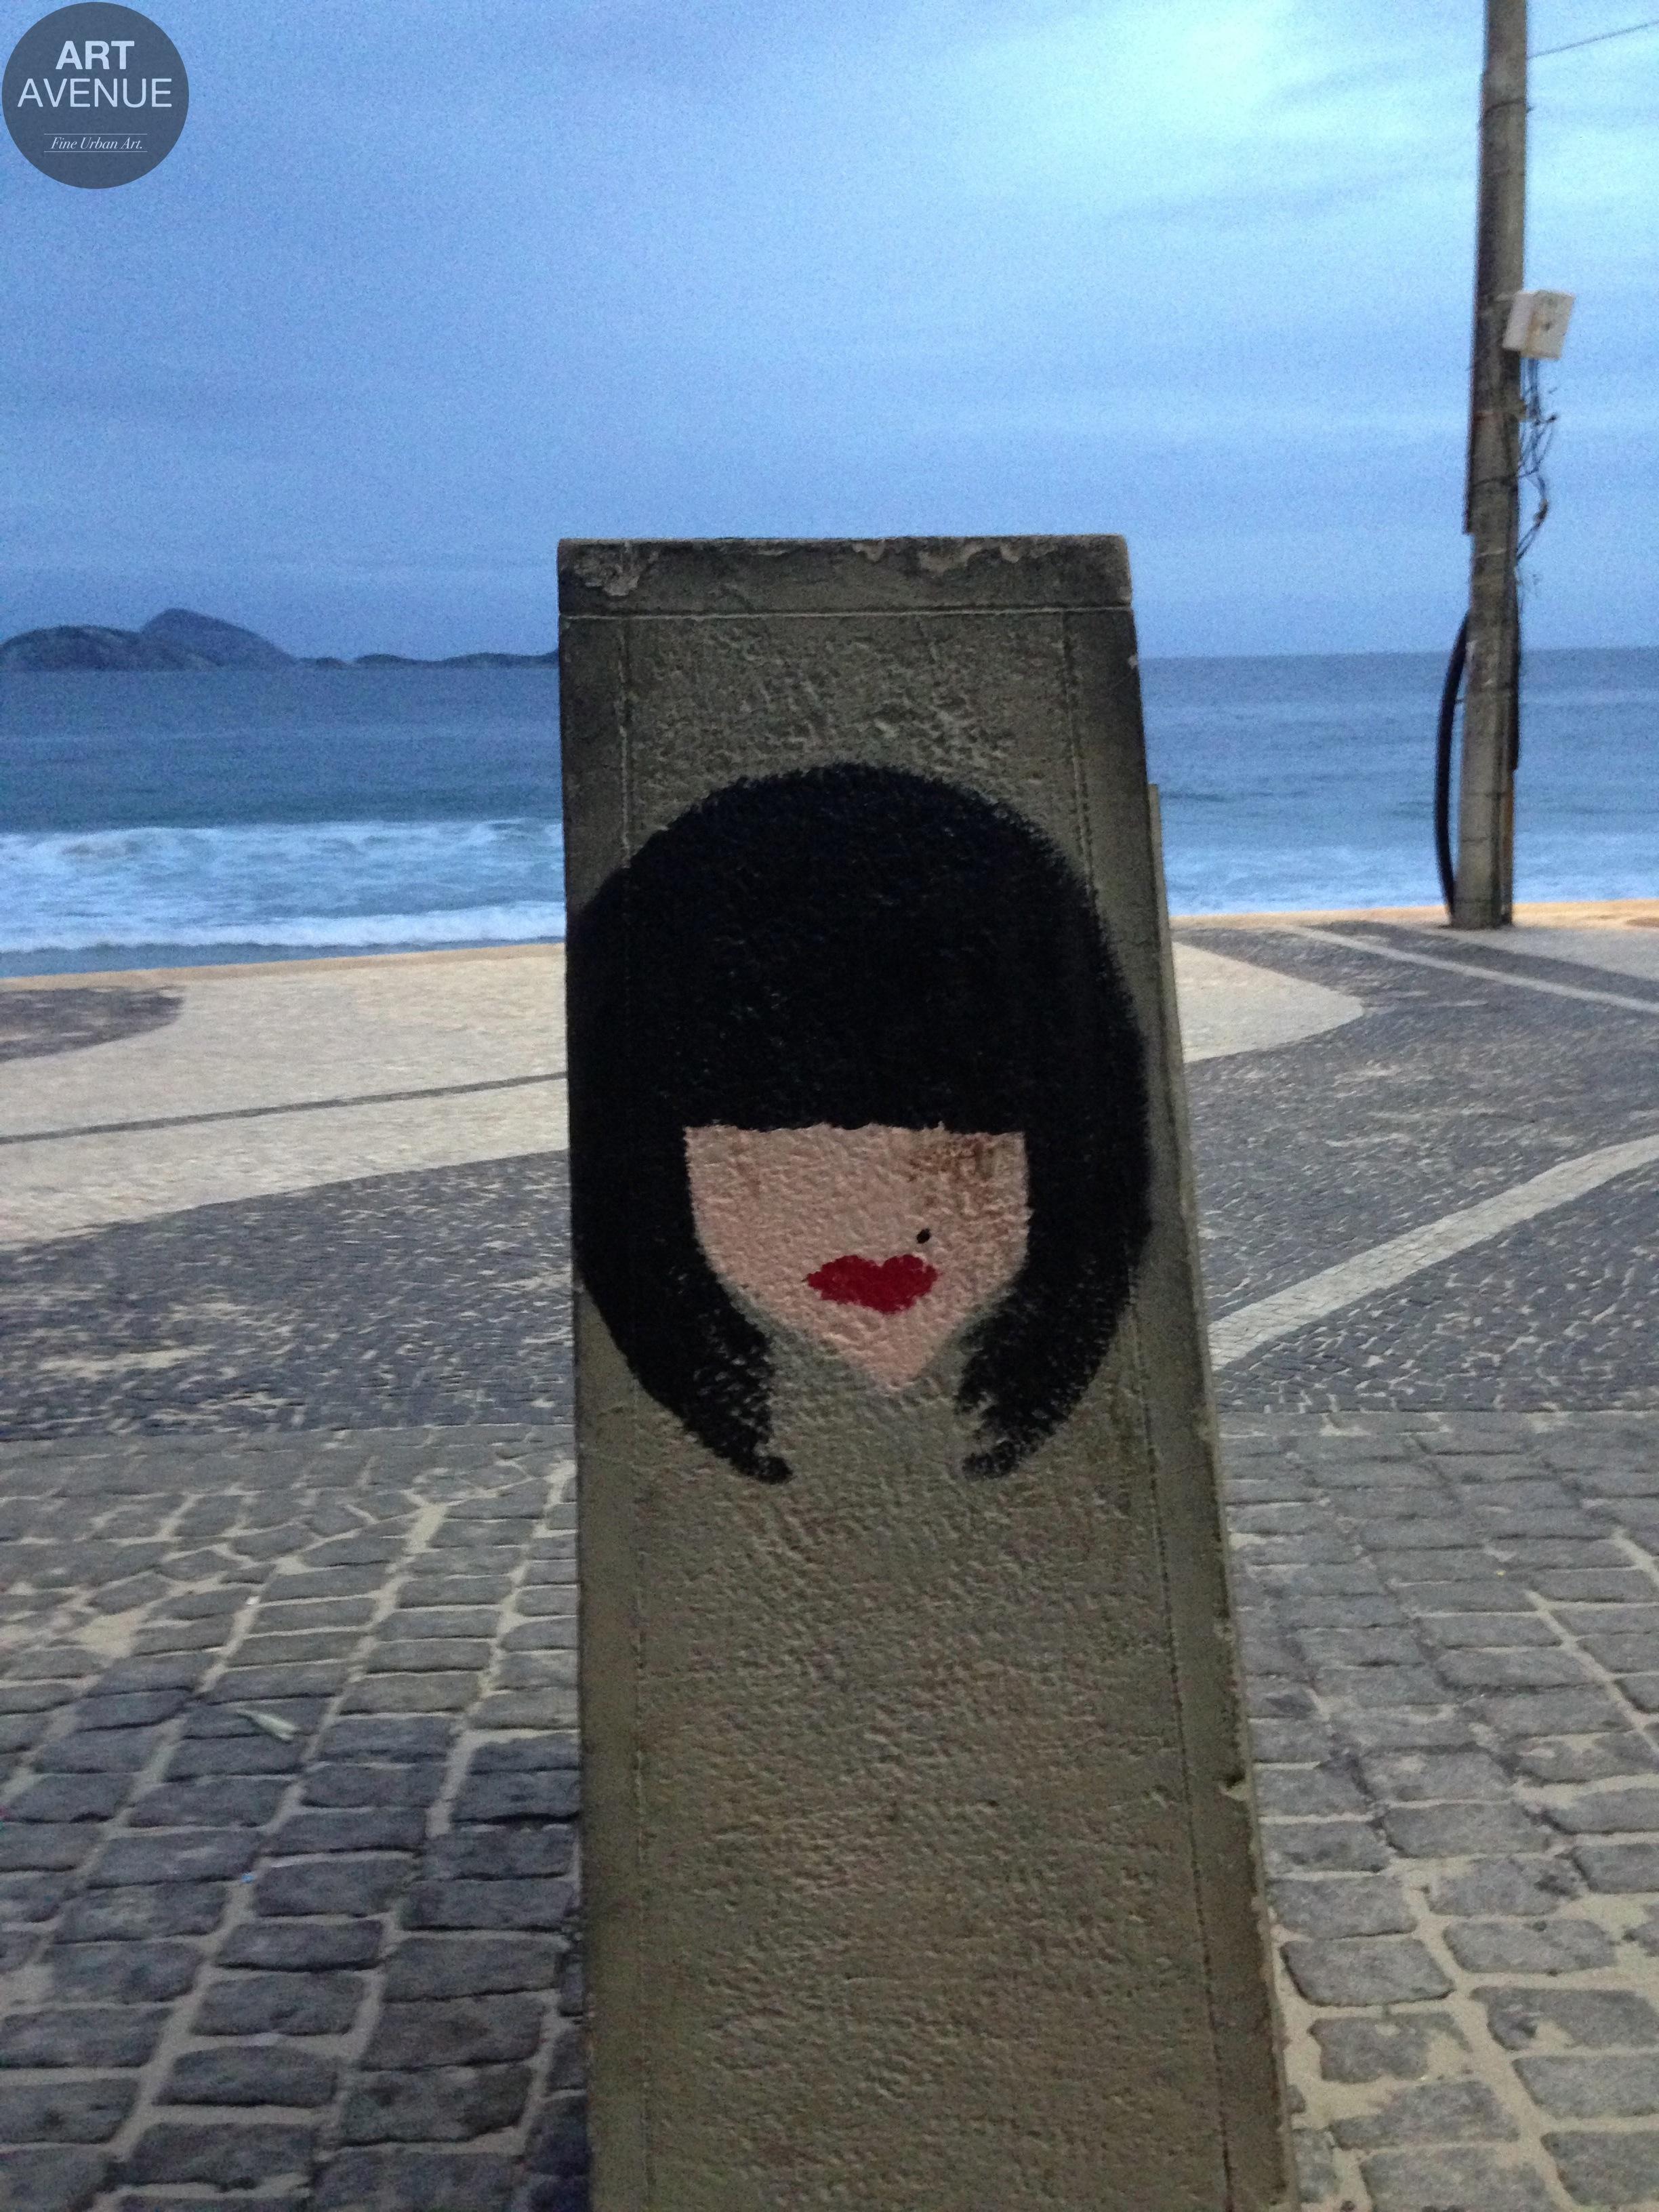 ART AVENUE Travel Report Rio de Janeiro, Brasil. Part 2: Ipanema Beach